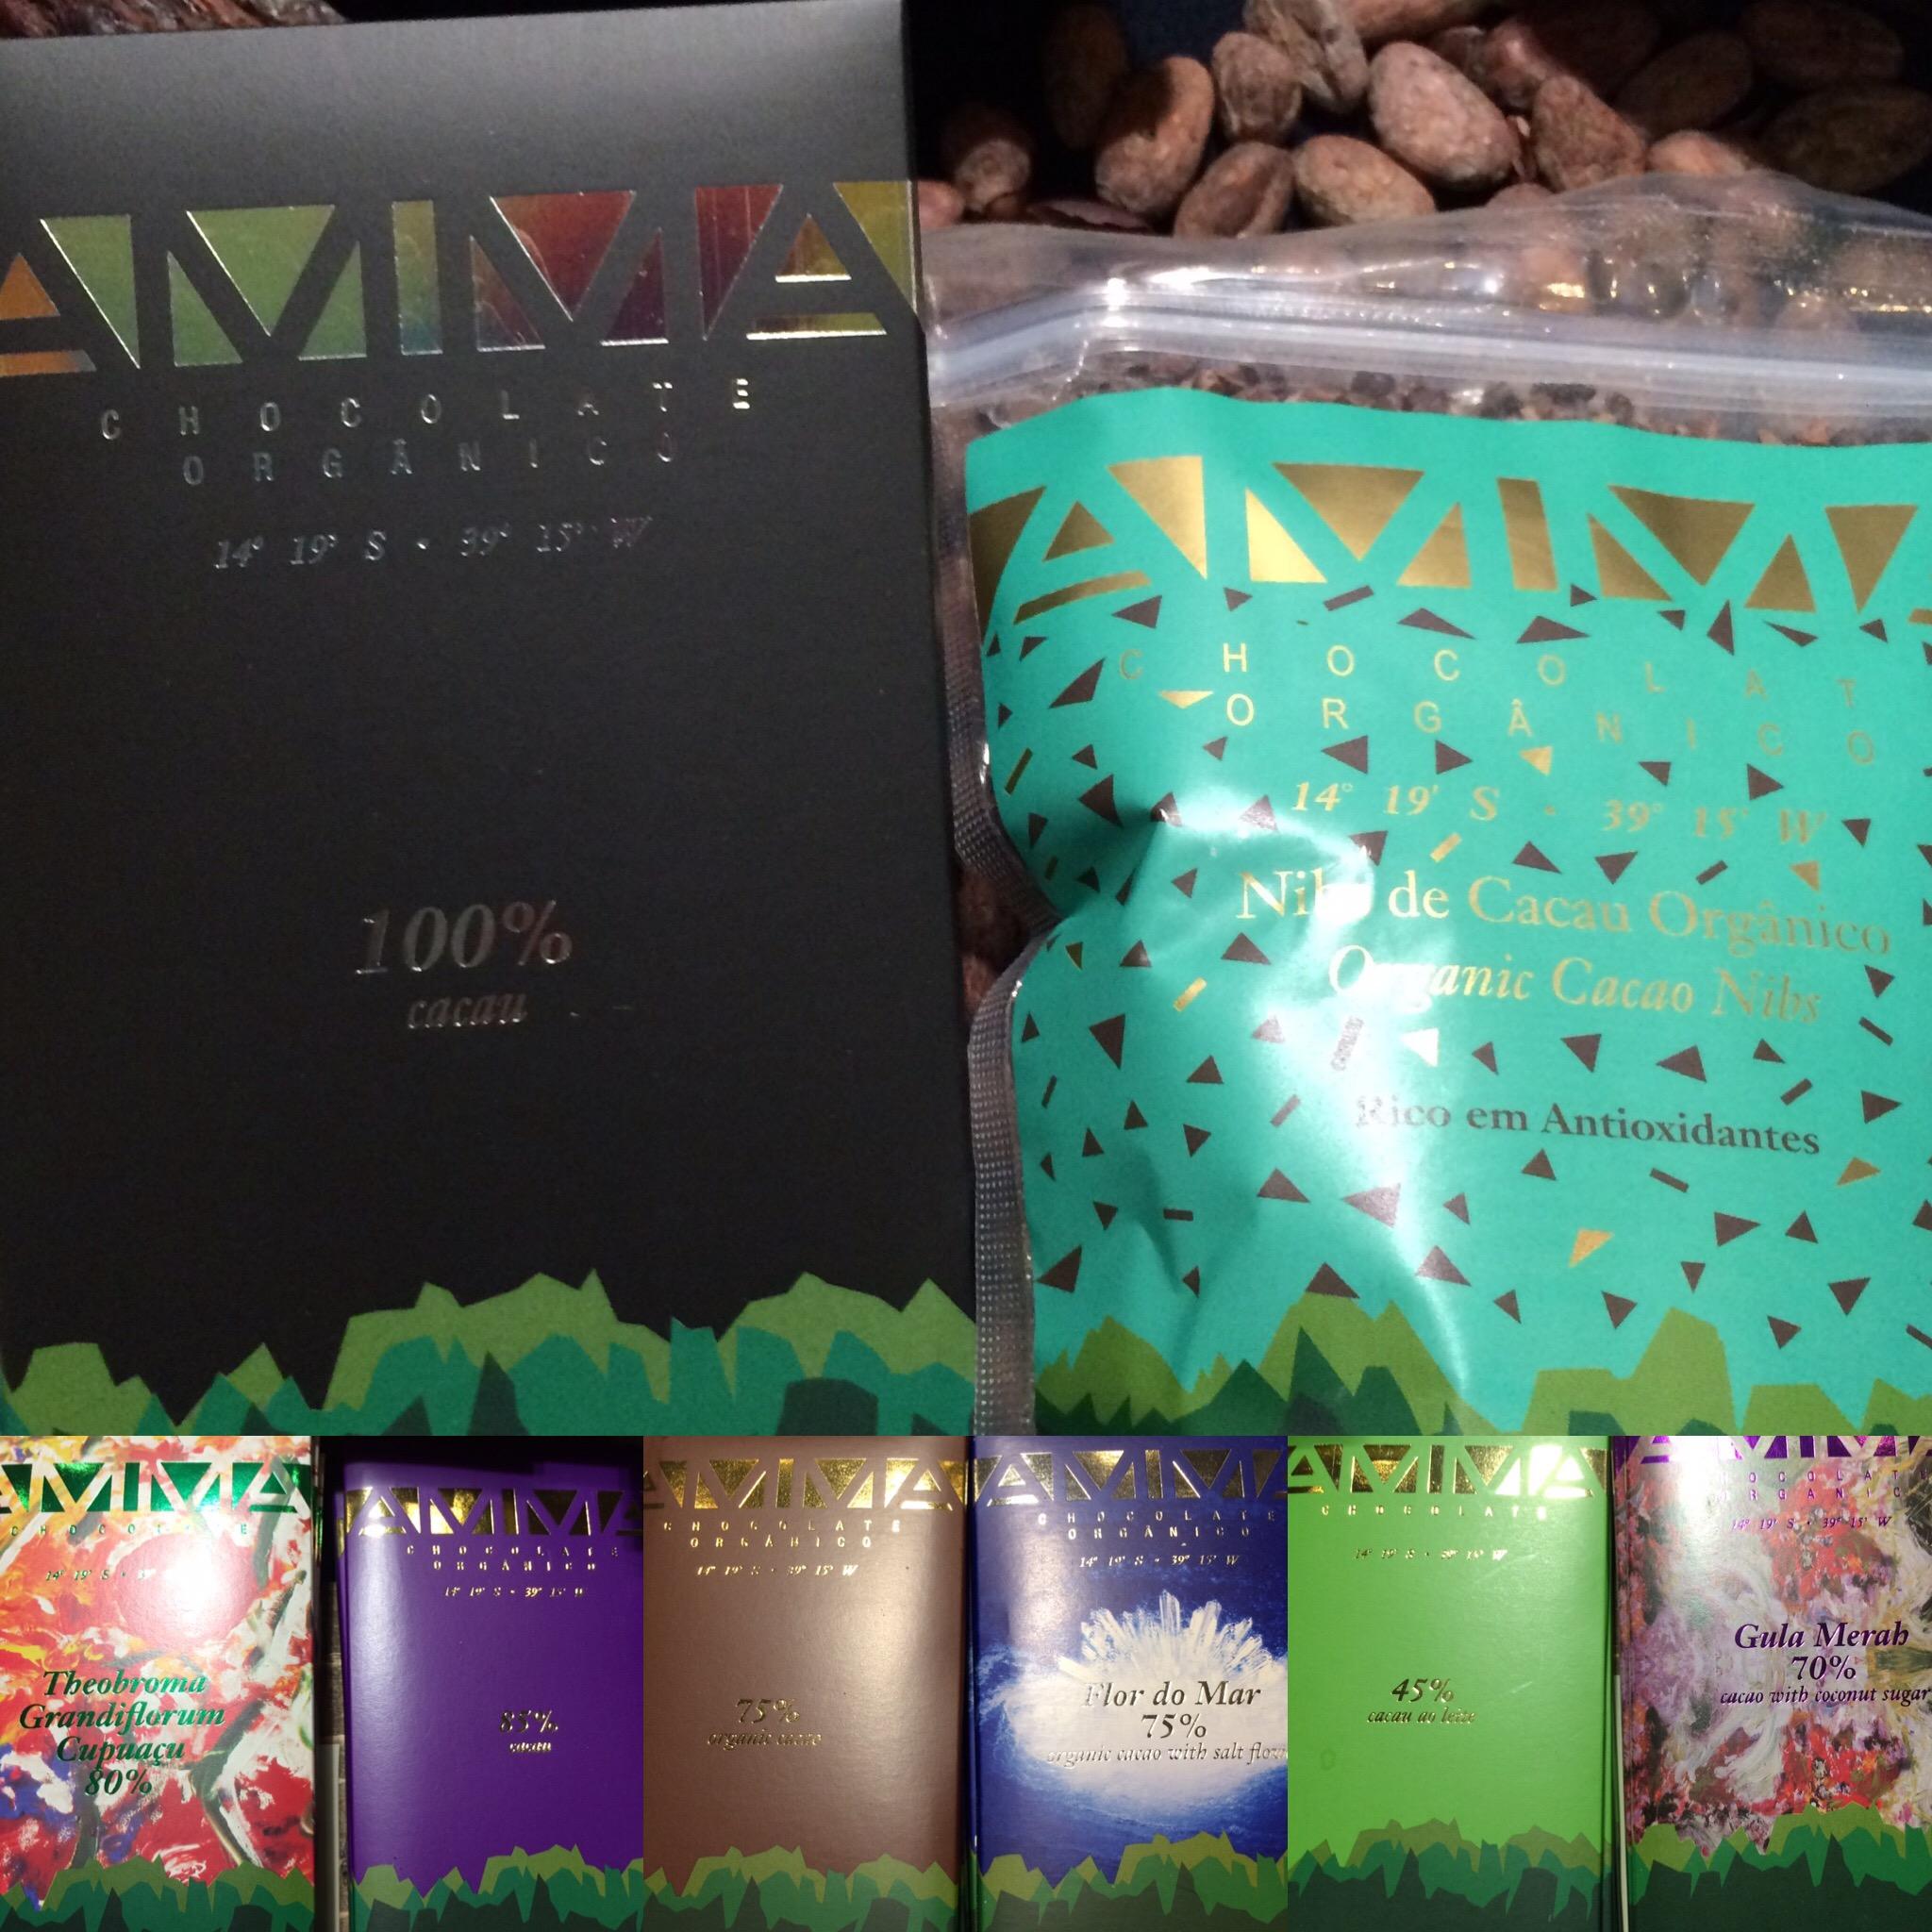 AMMA_chocolate @thechocpro